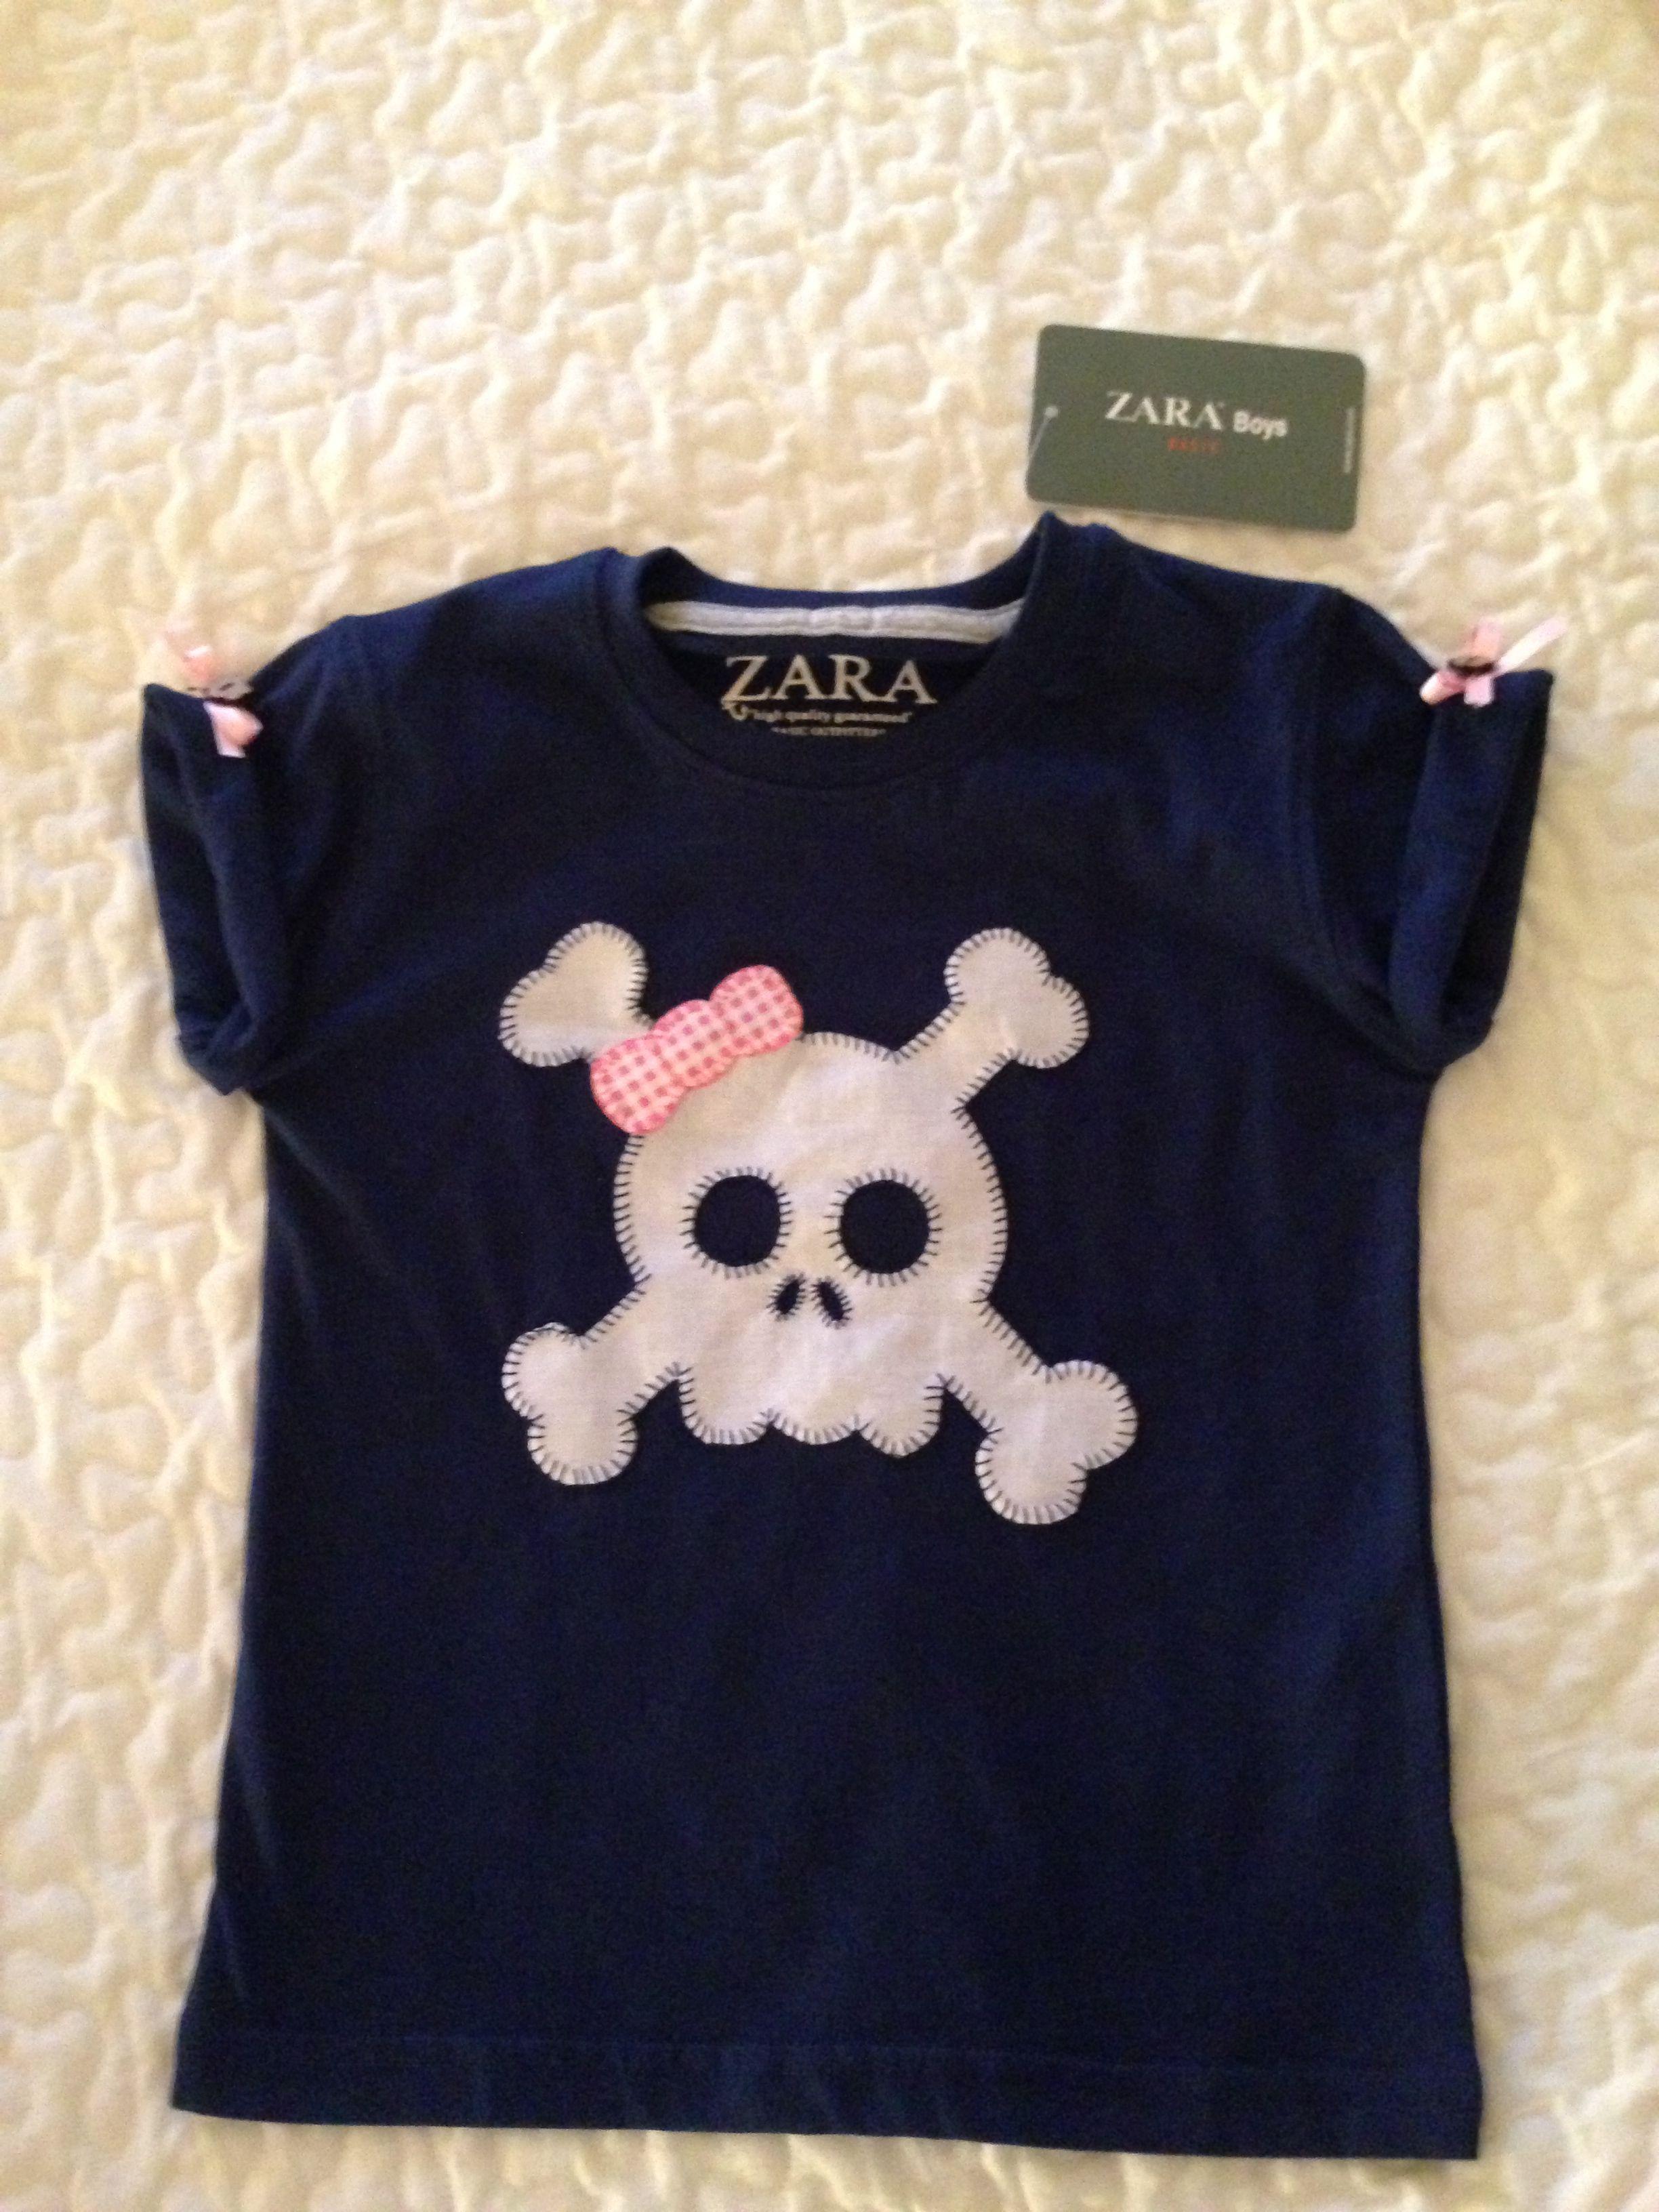 Calavera Apliques For Women Shirts Camiseta Pinterest T Niña OAn7wqav